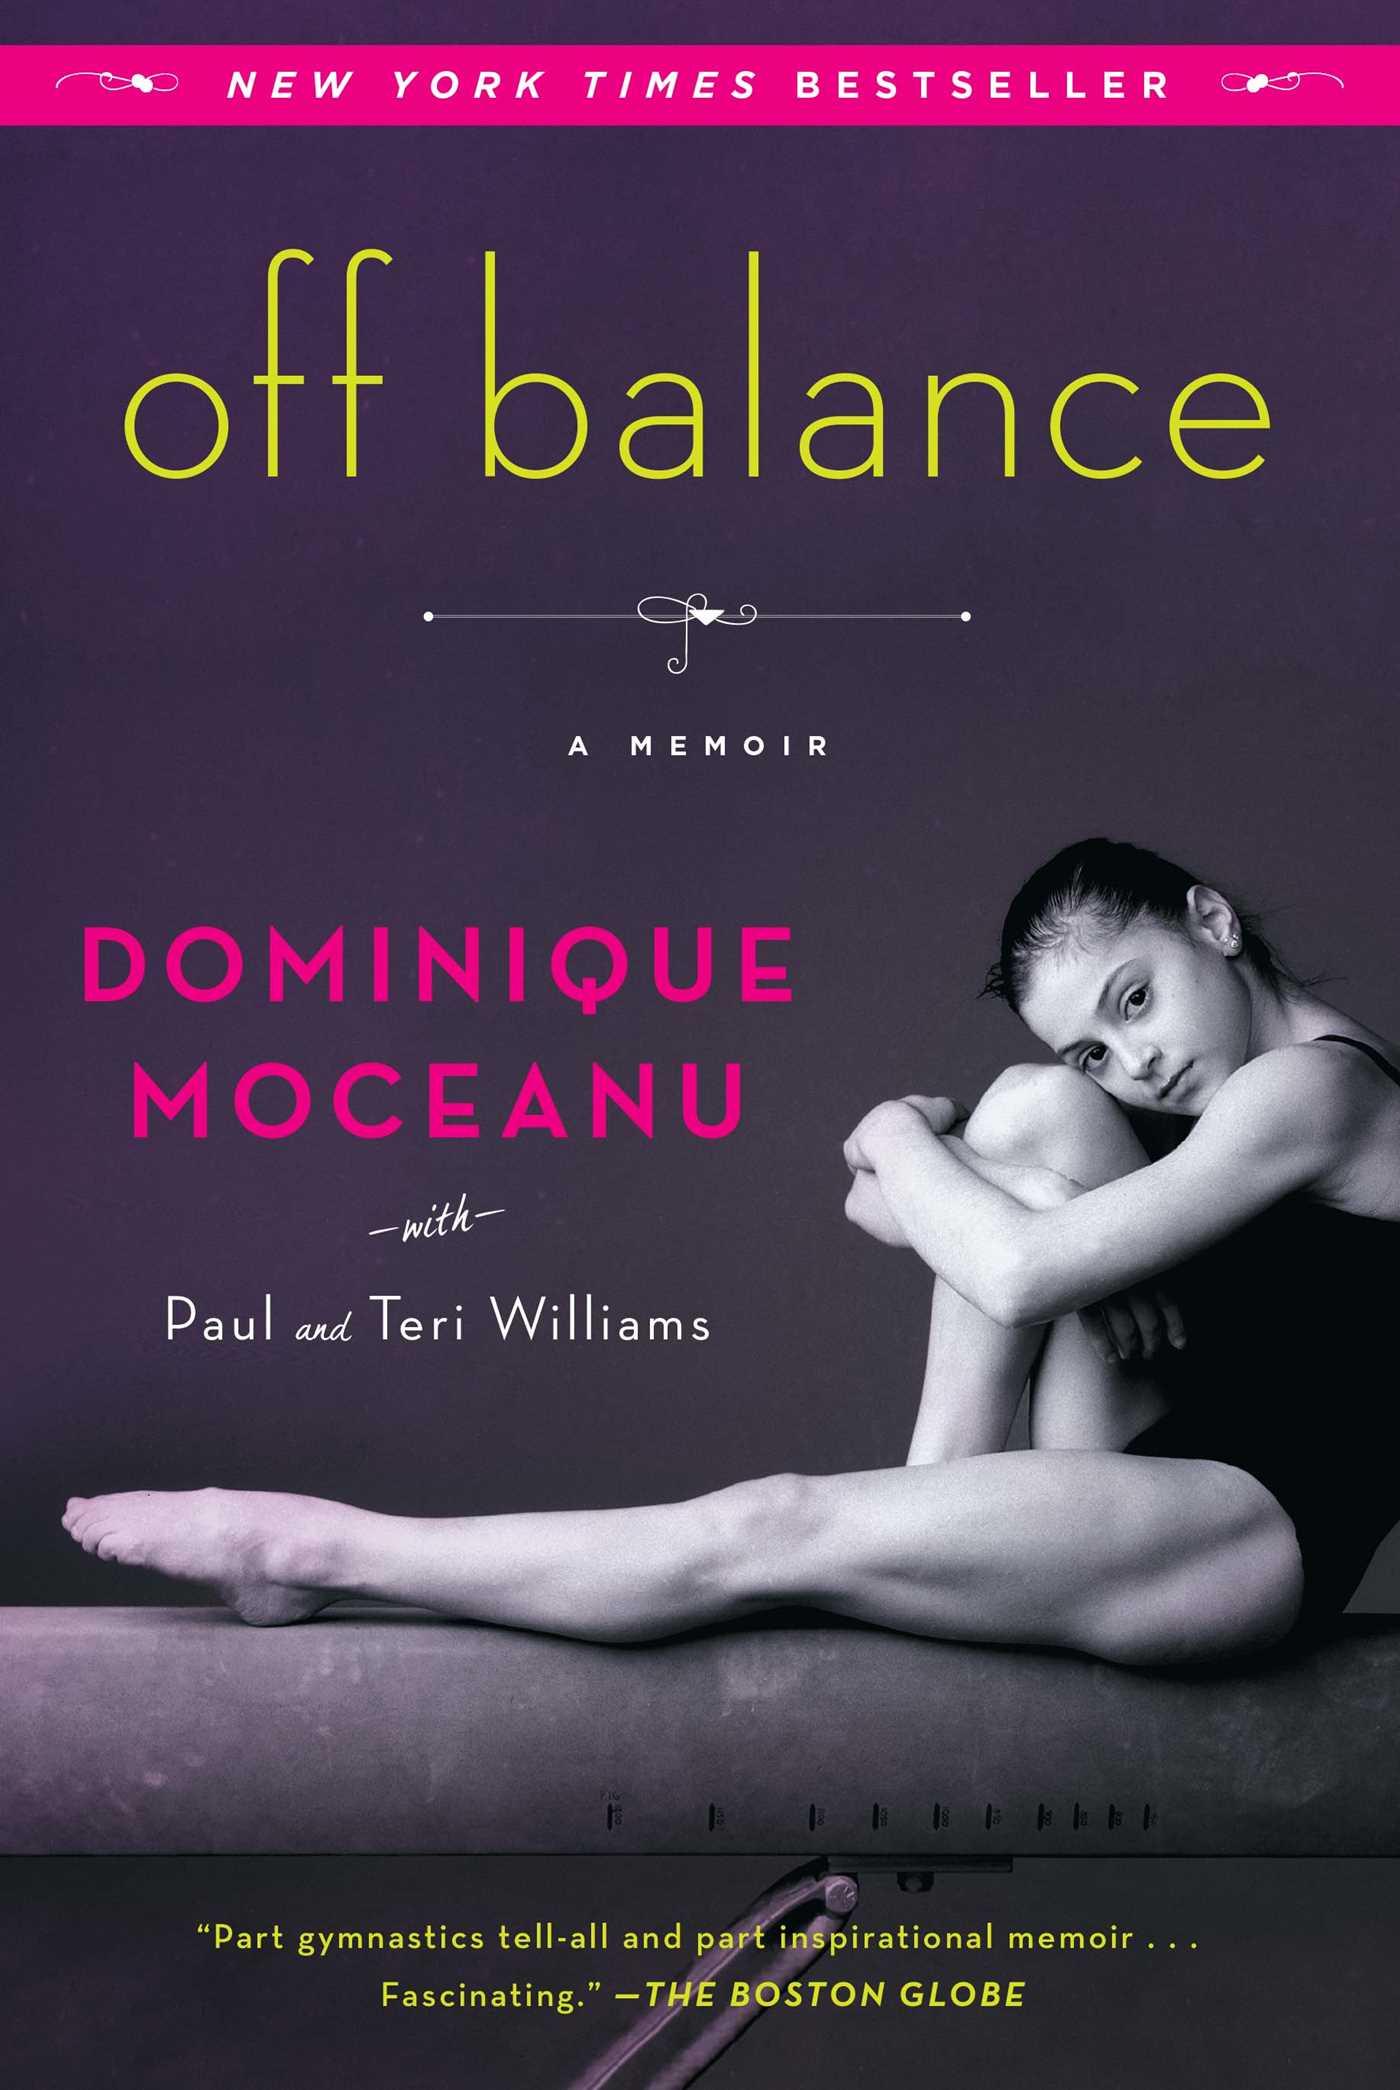 Off balance 9781451608663 hr